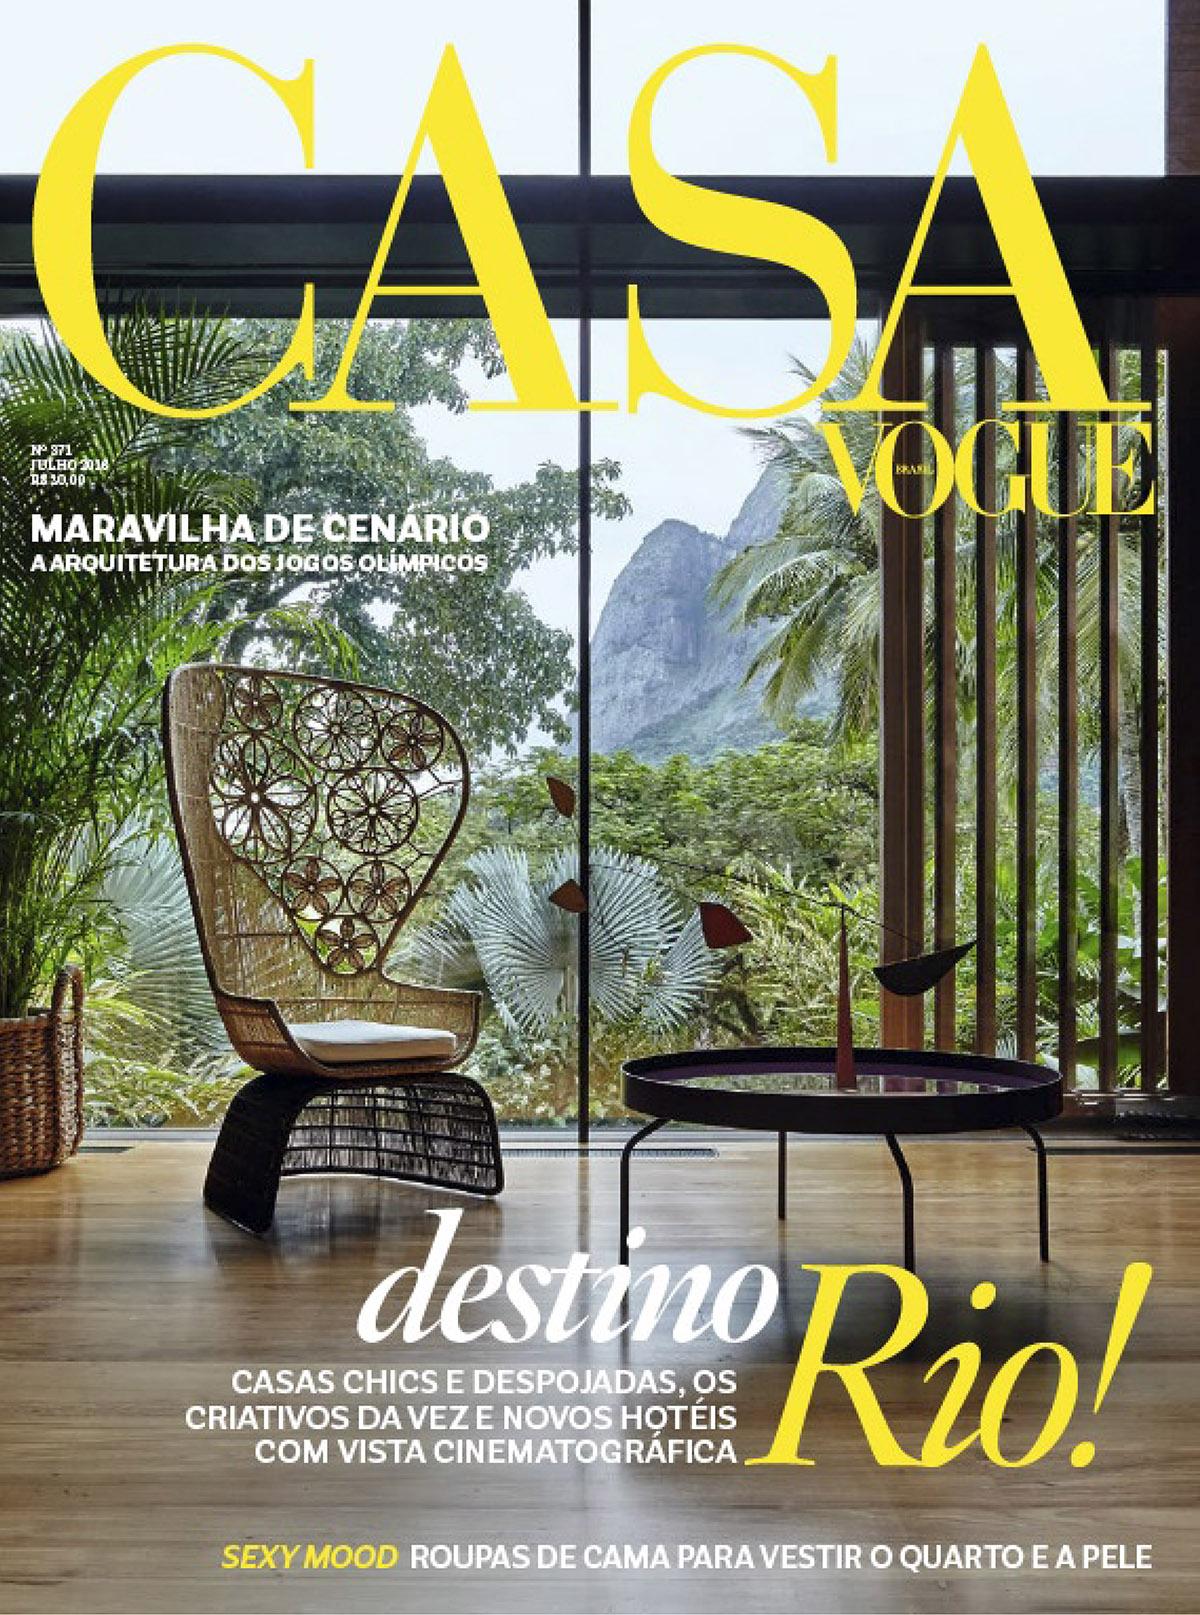 Shalini misra casa vogue magazine july 2016 design for Casa magazine